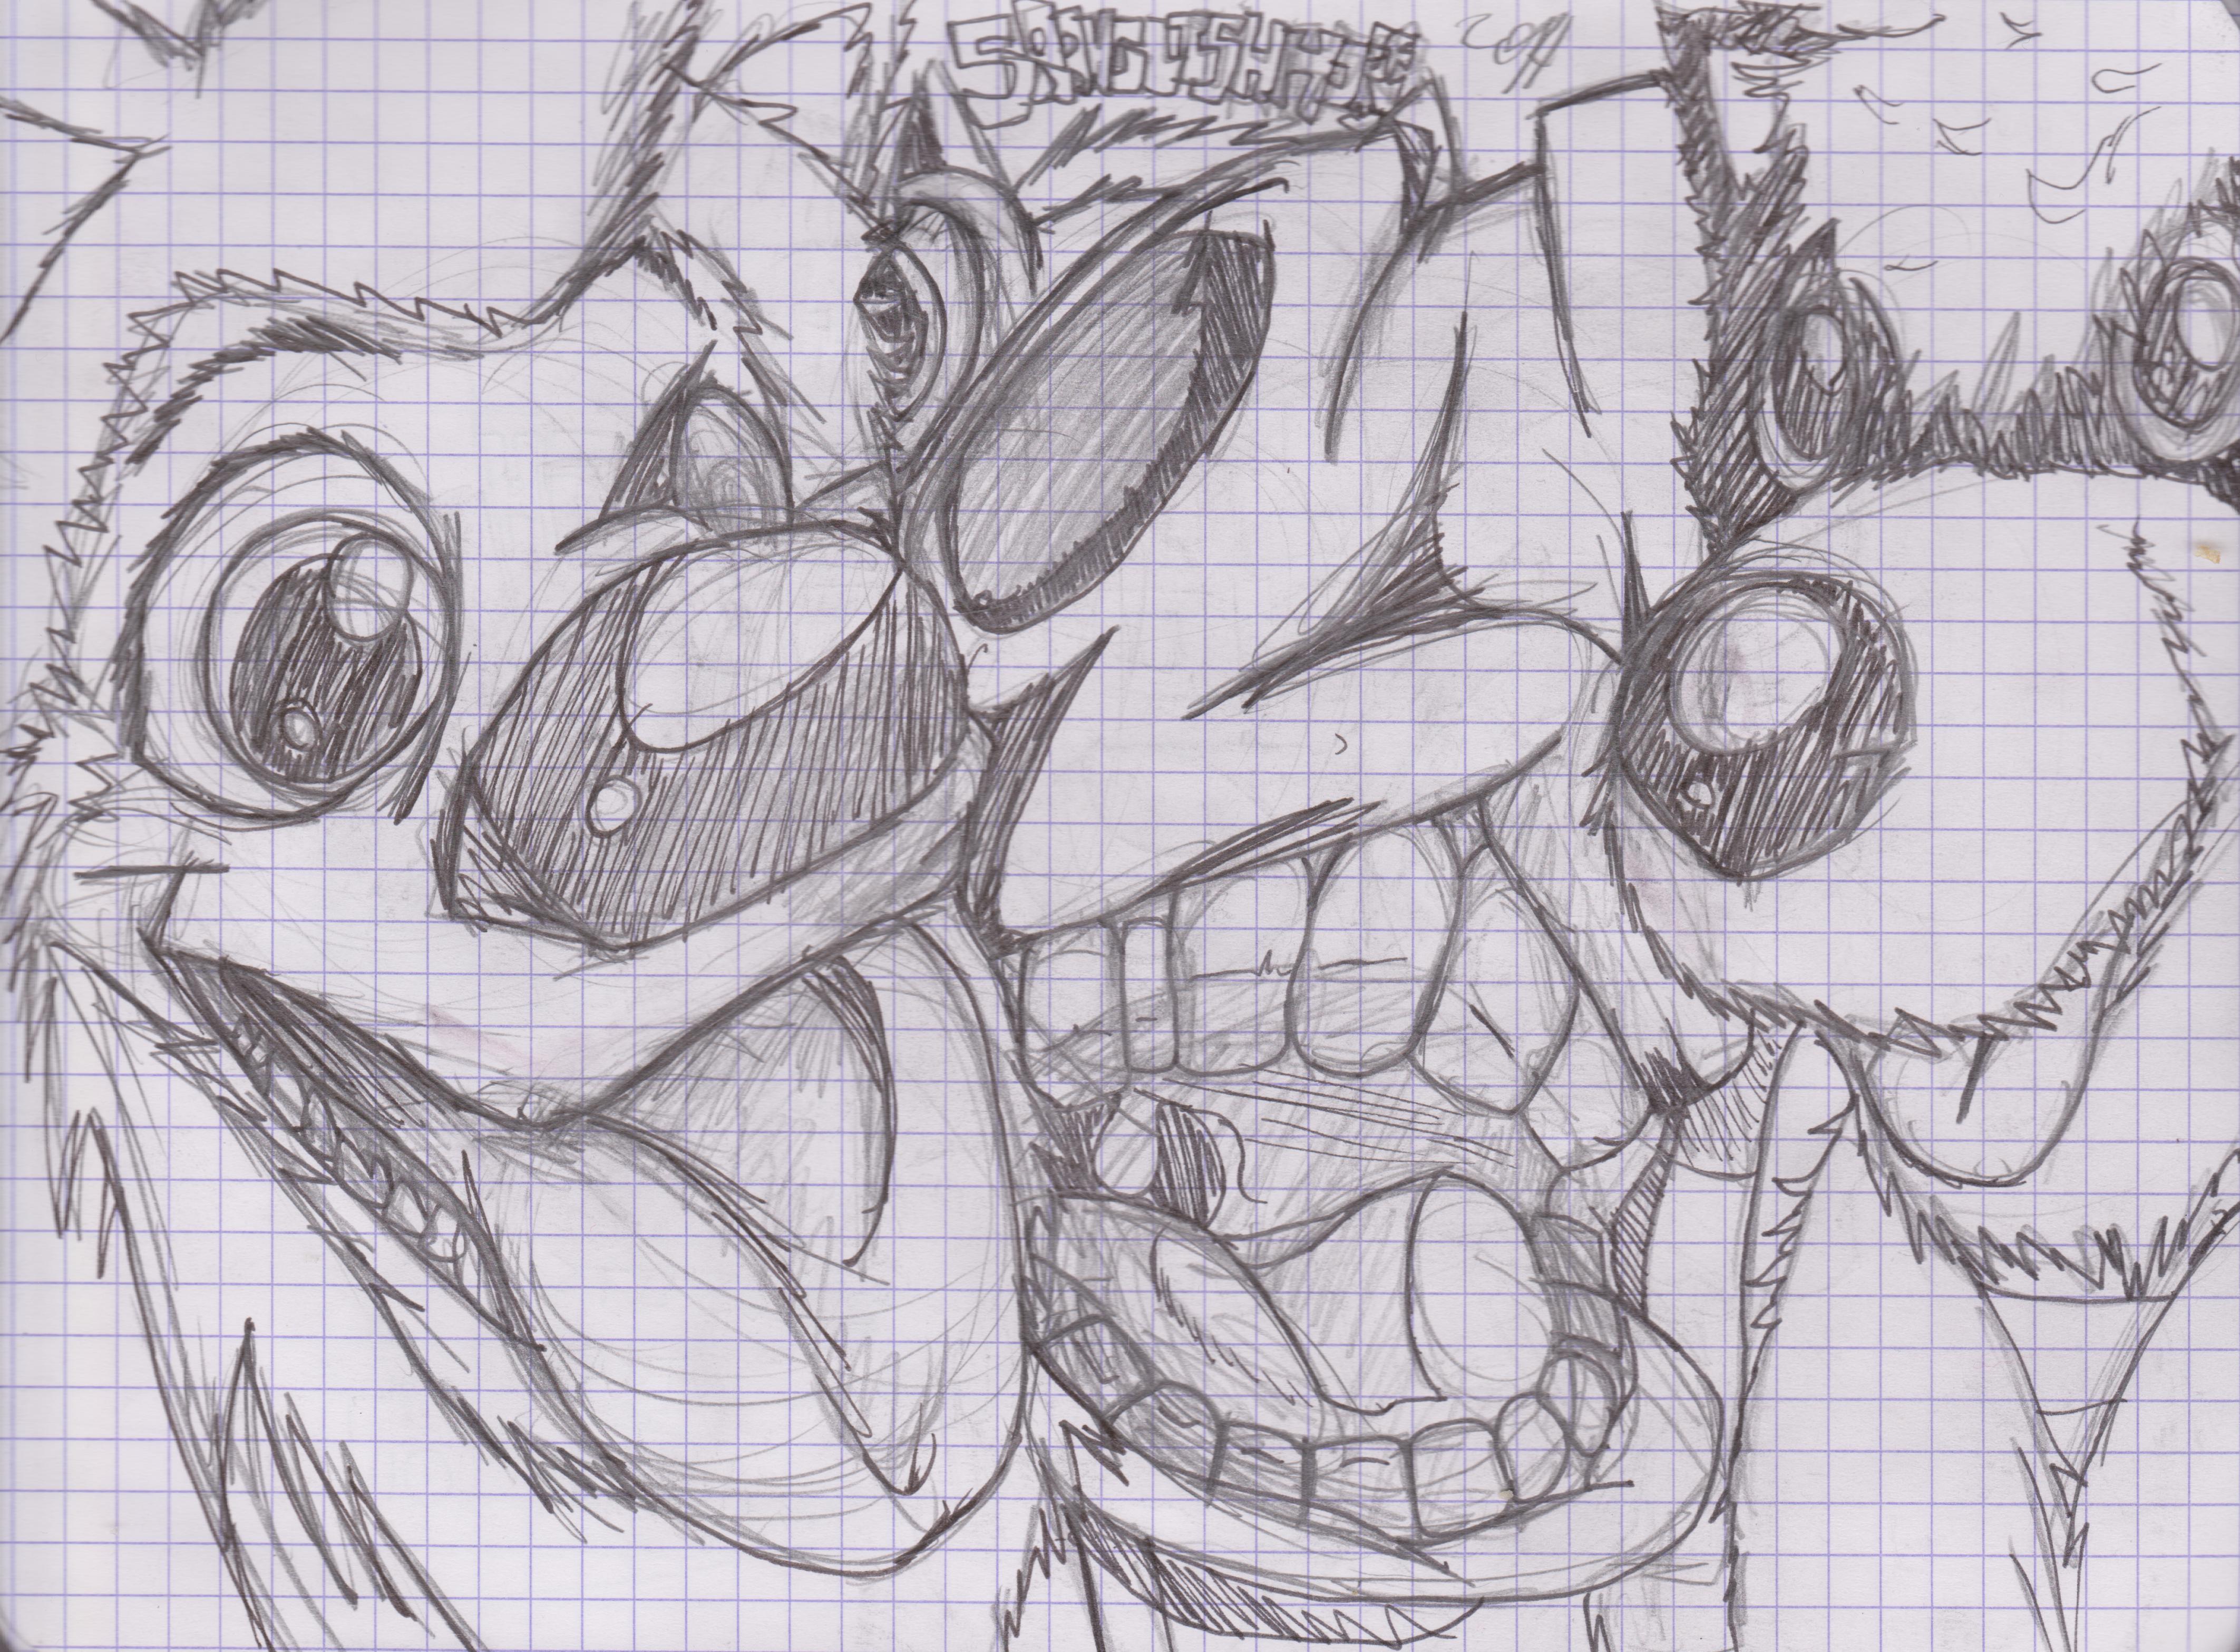 SH sketchbook page 13